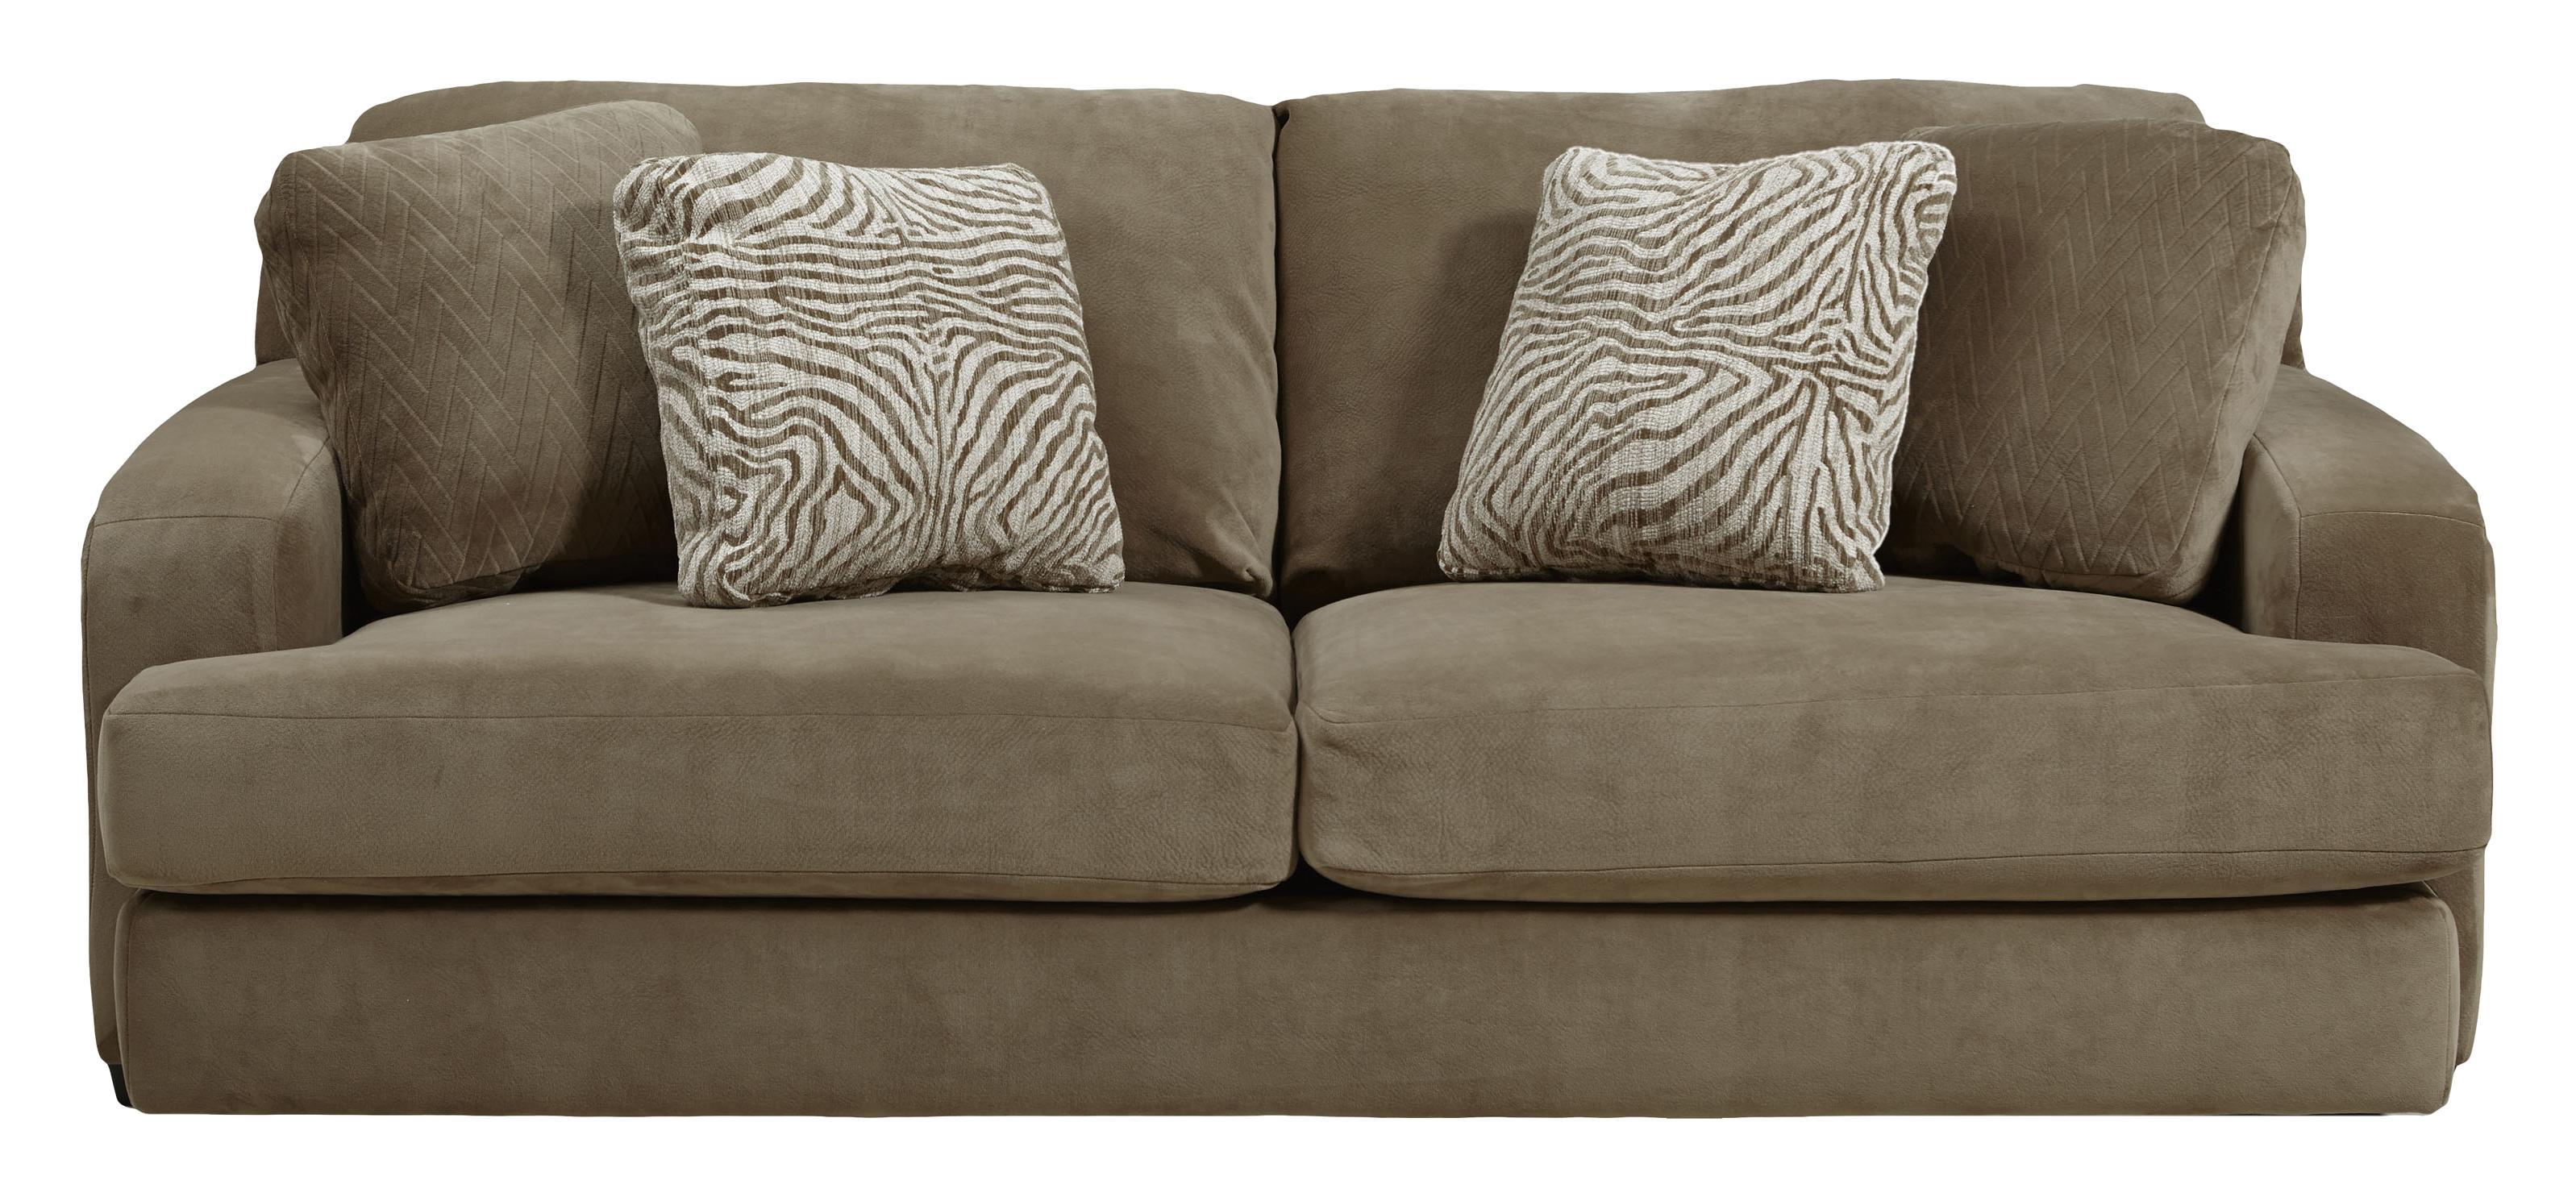 Jackson Furniture Palisades Sofa - Item Number: 4186-03 Bronze